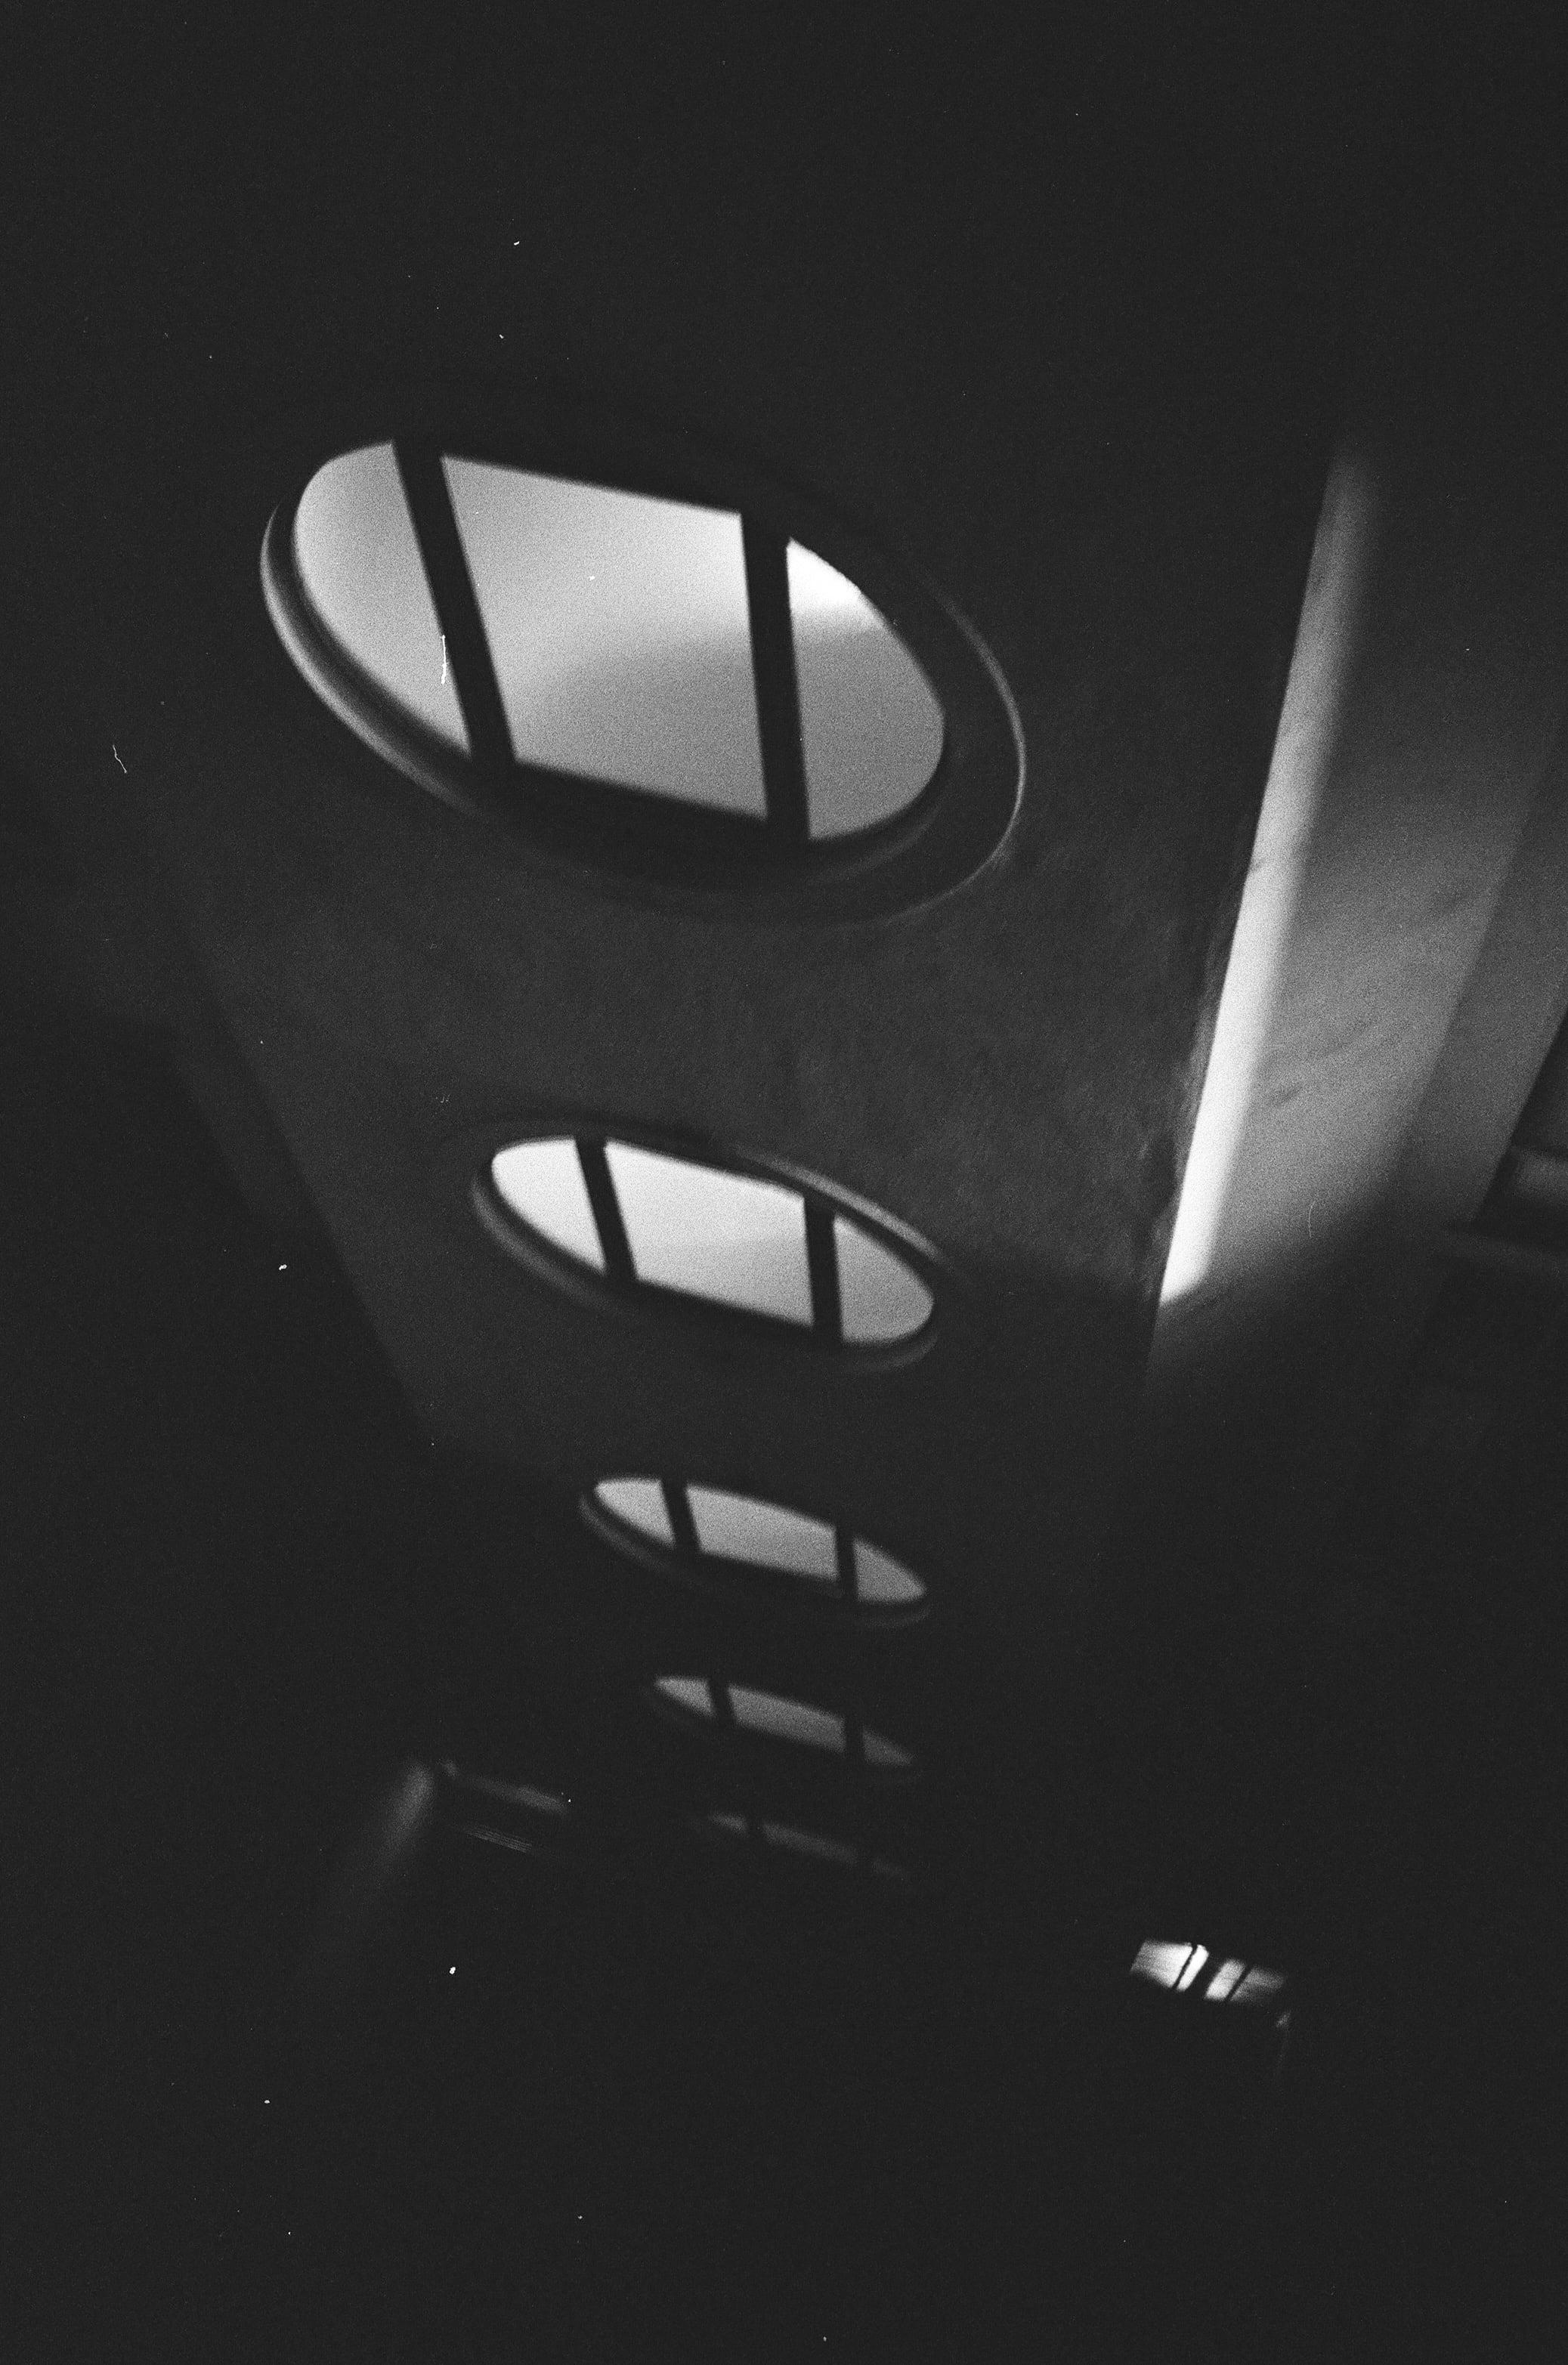 ChristosVourlis_photography_CVHAIR_CVDIARY_personal diary__film_35mm_0005_###.jpg